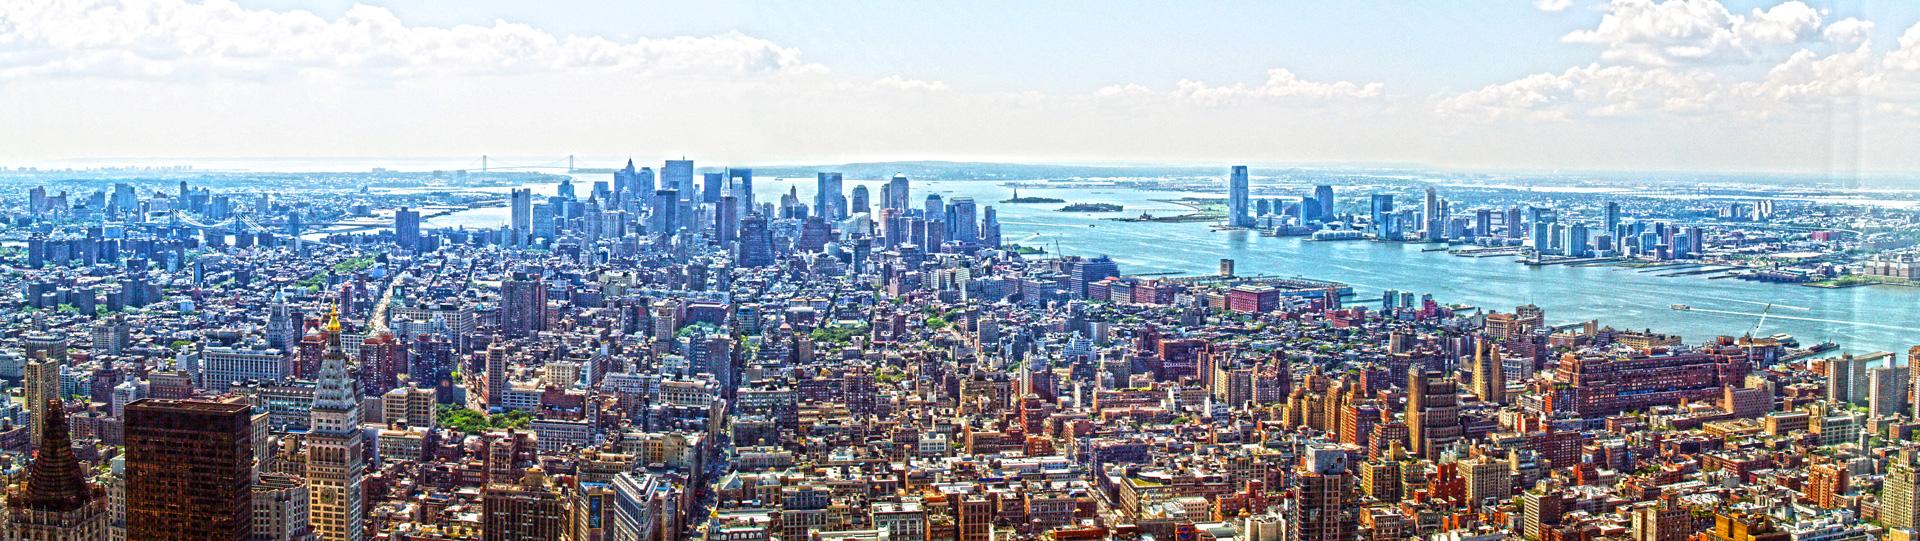 RASCACIELOS (EMPIRE STATE BUILDING. NEW YORK. EE.UU)